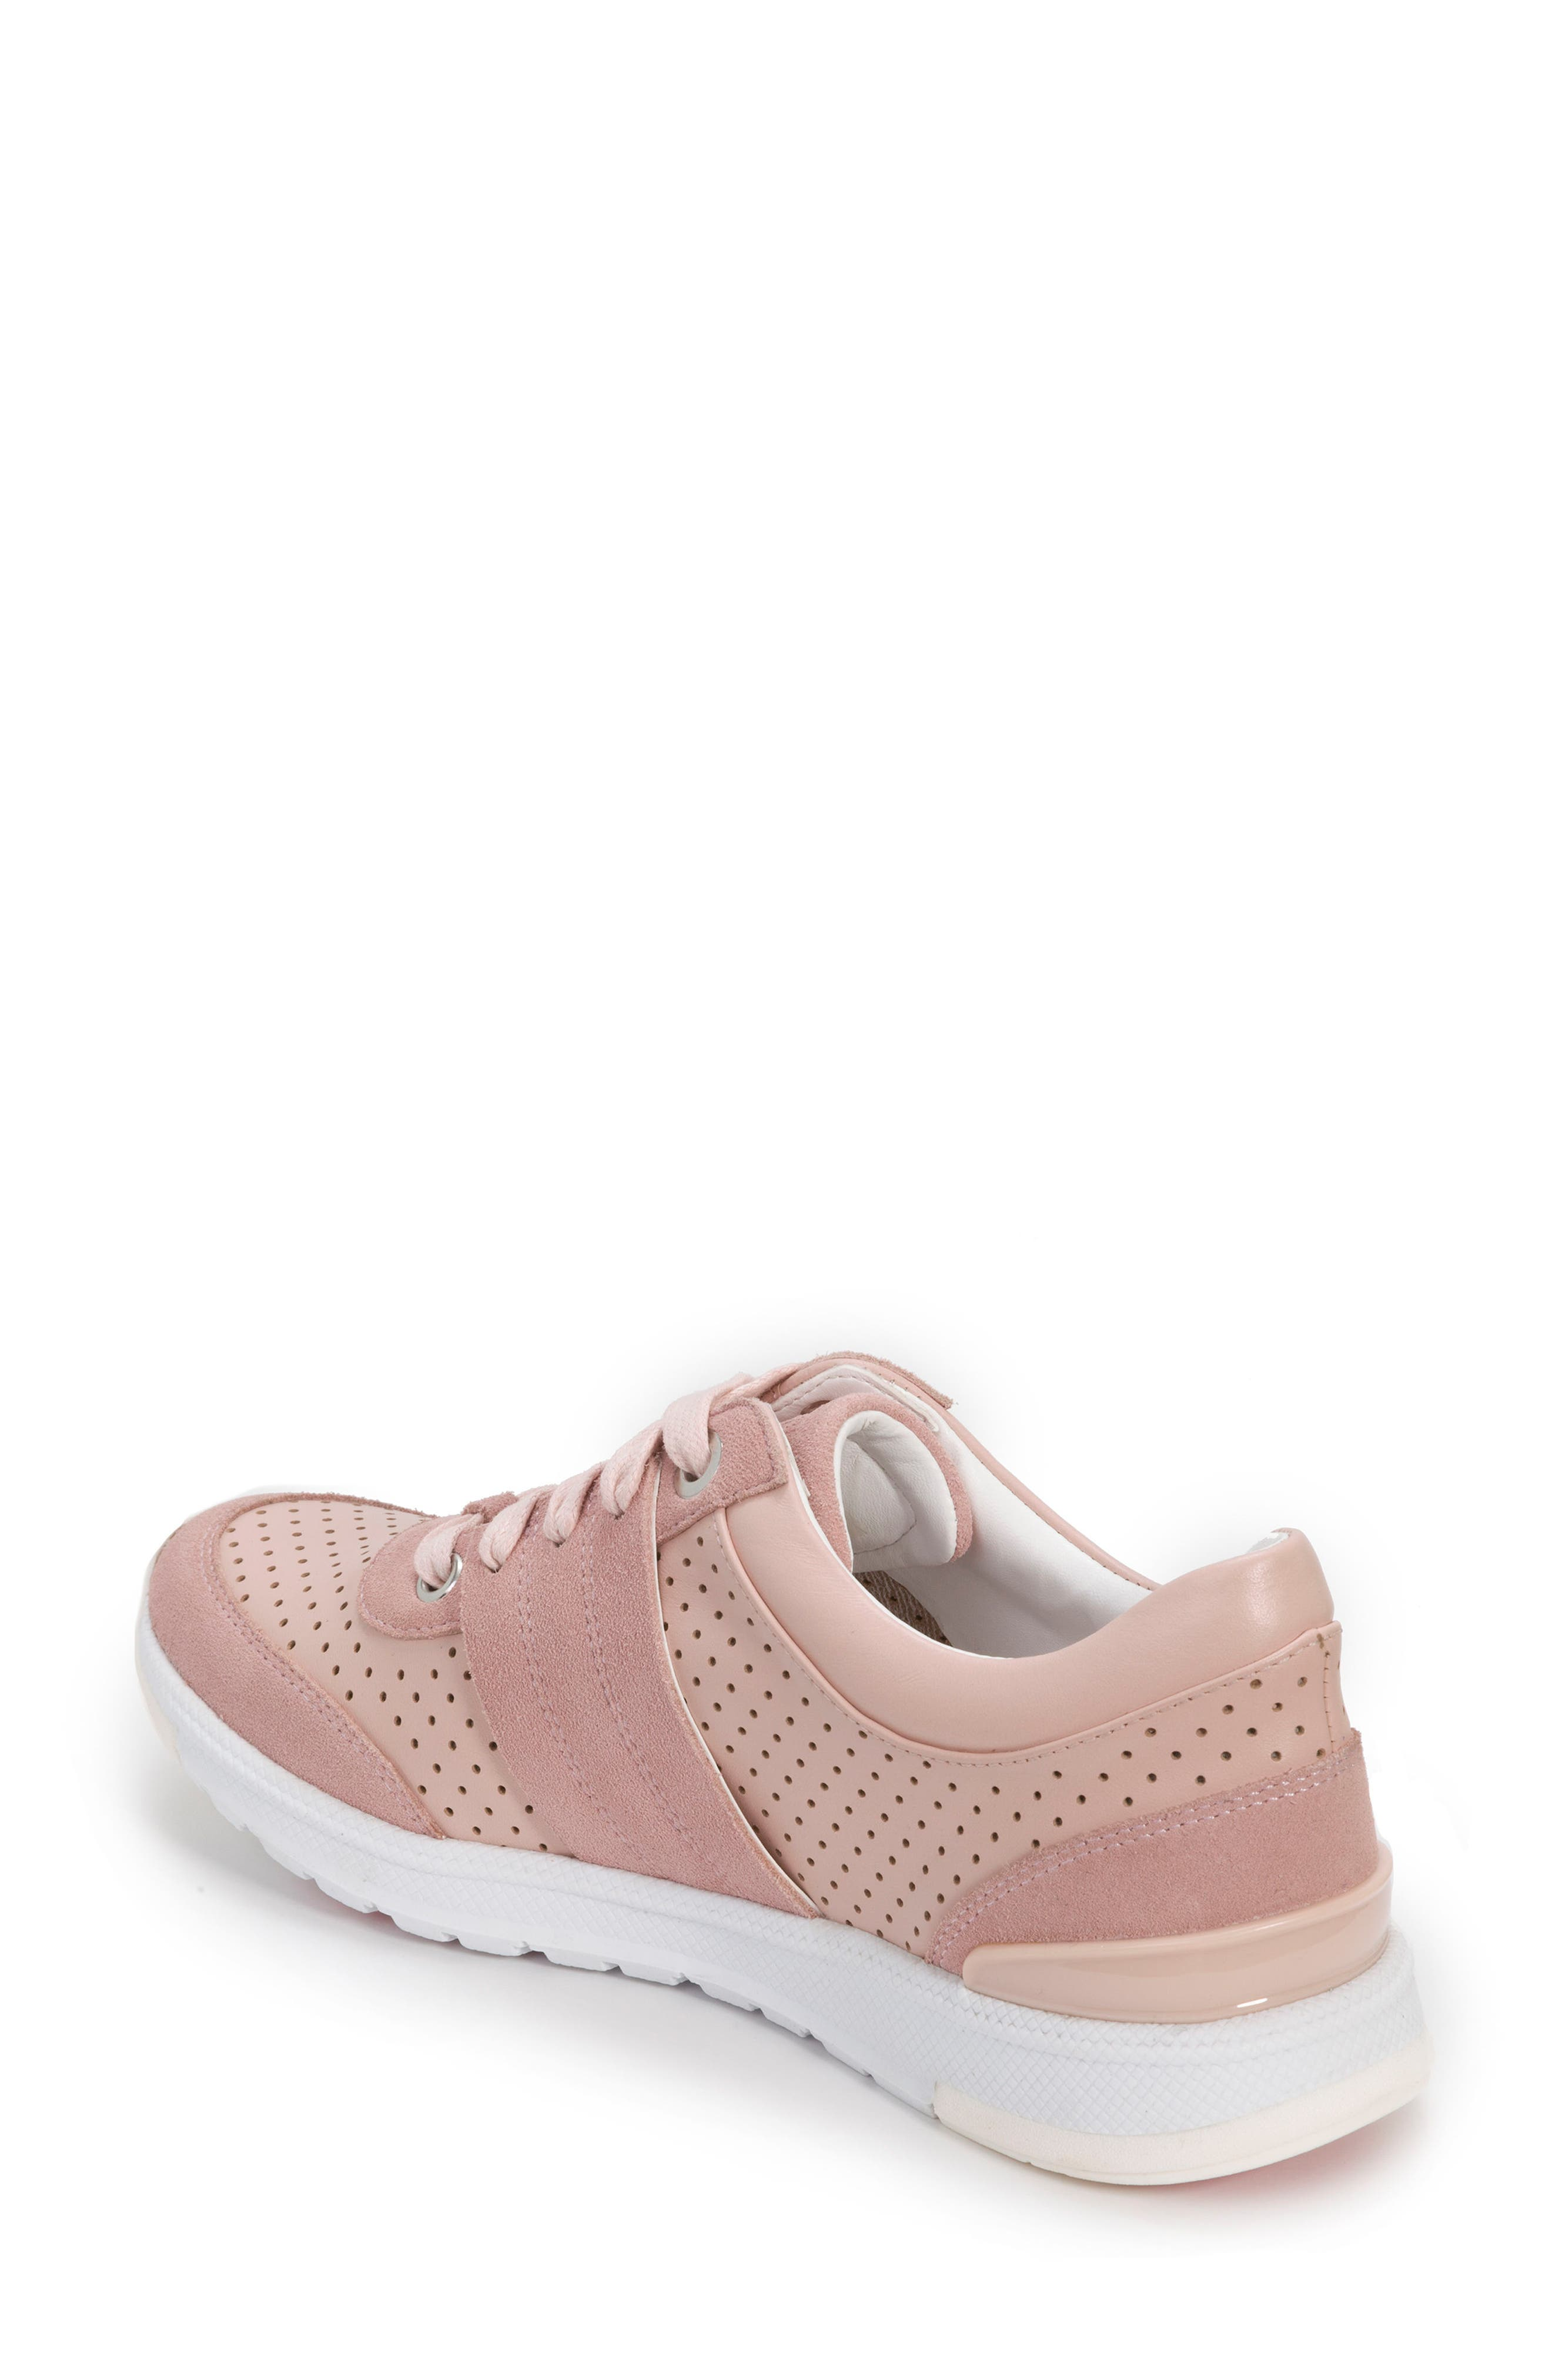 Bea Sneaker,                             Alternate thumbnail 2, color,                             Blush Leather